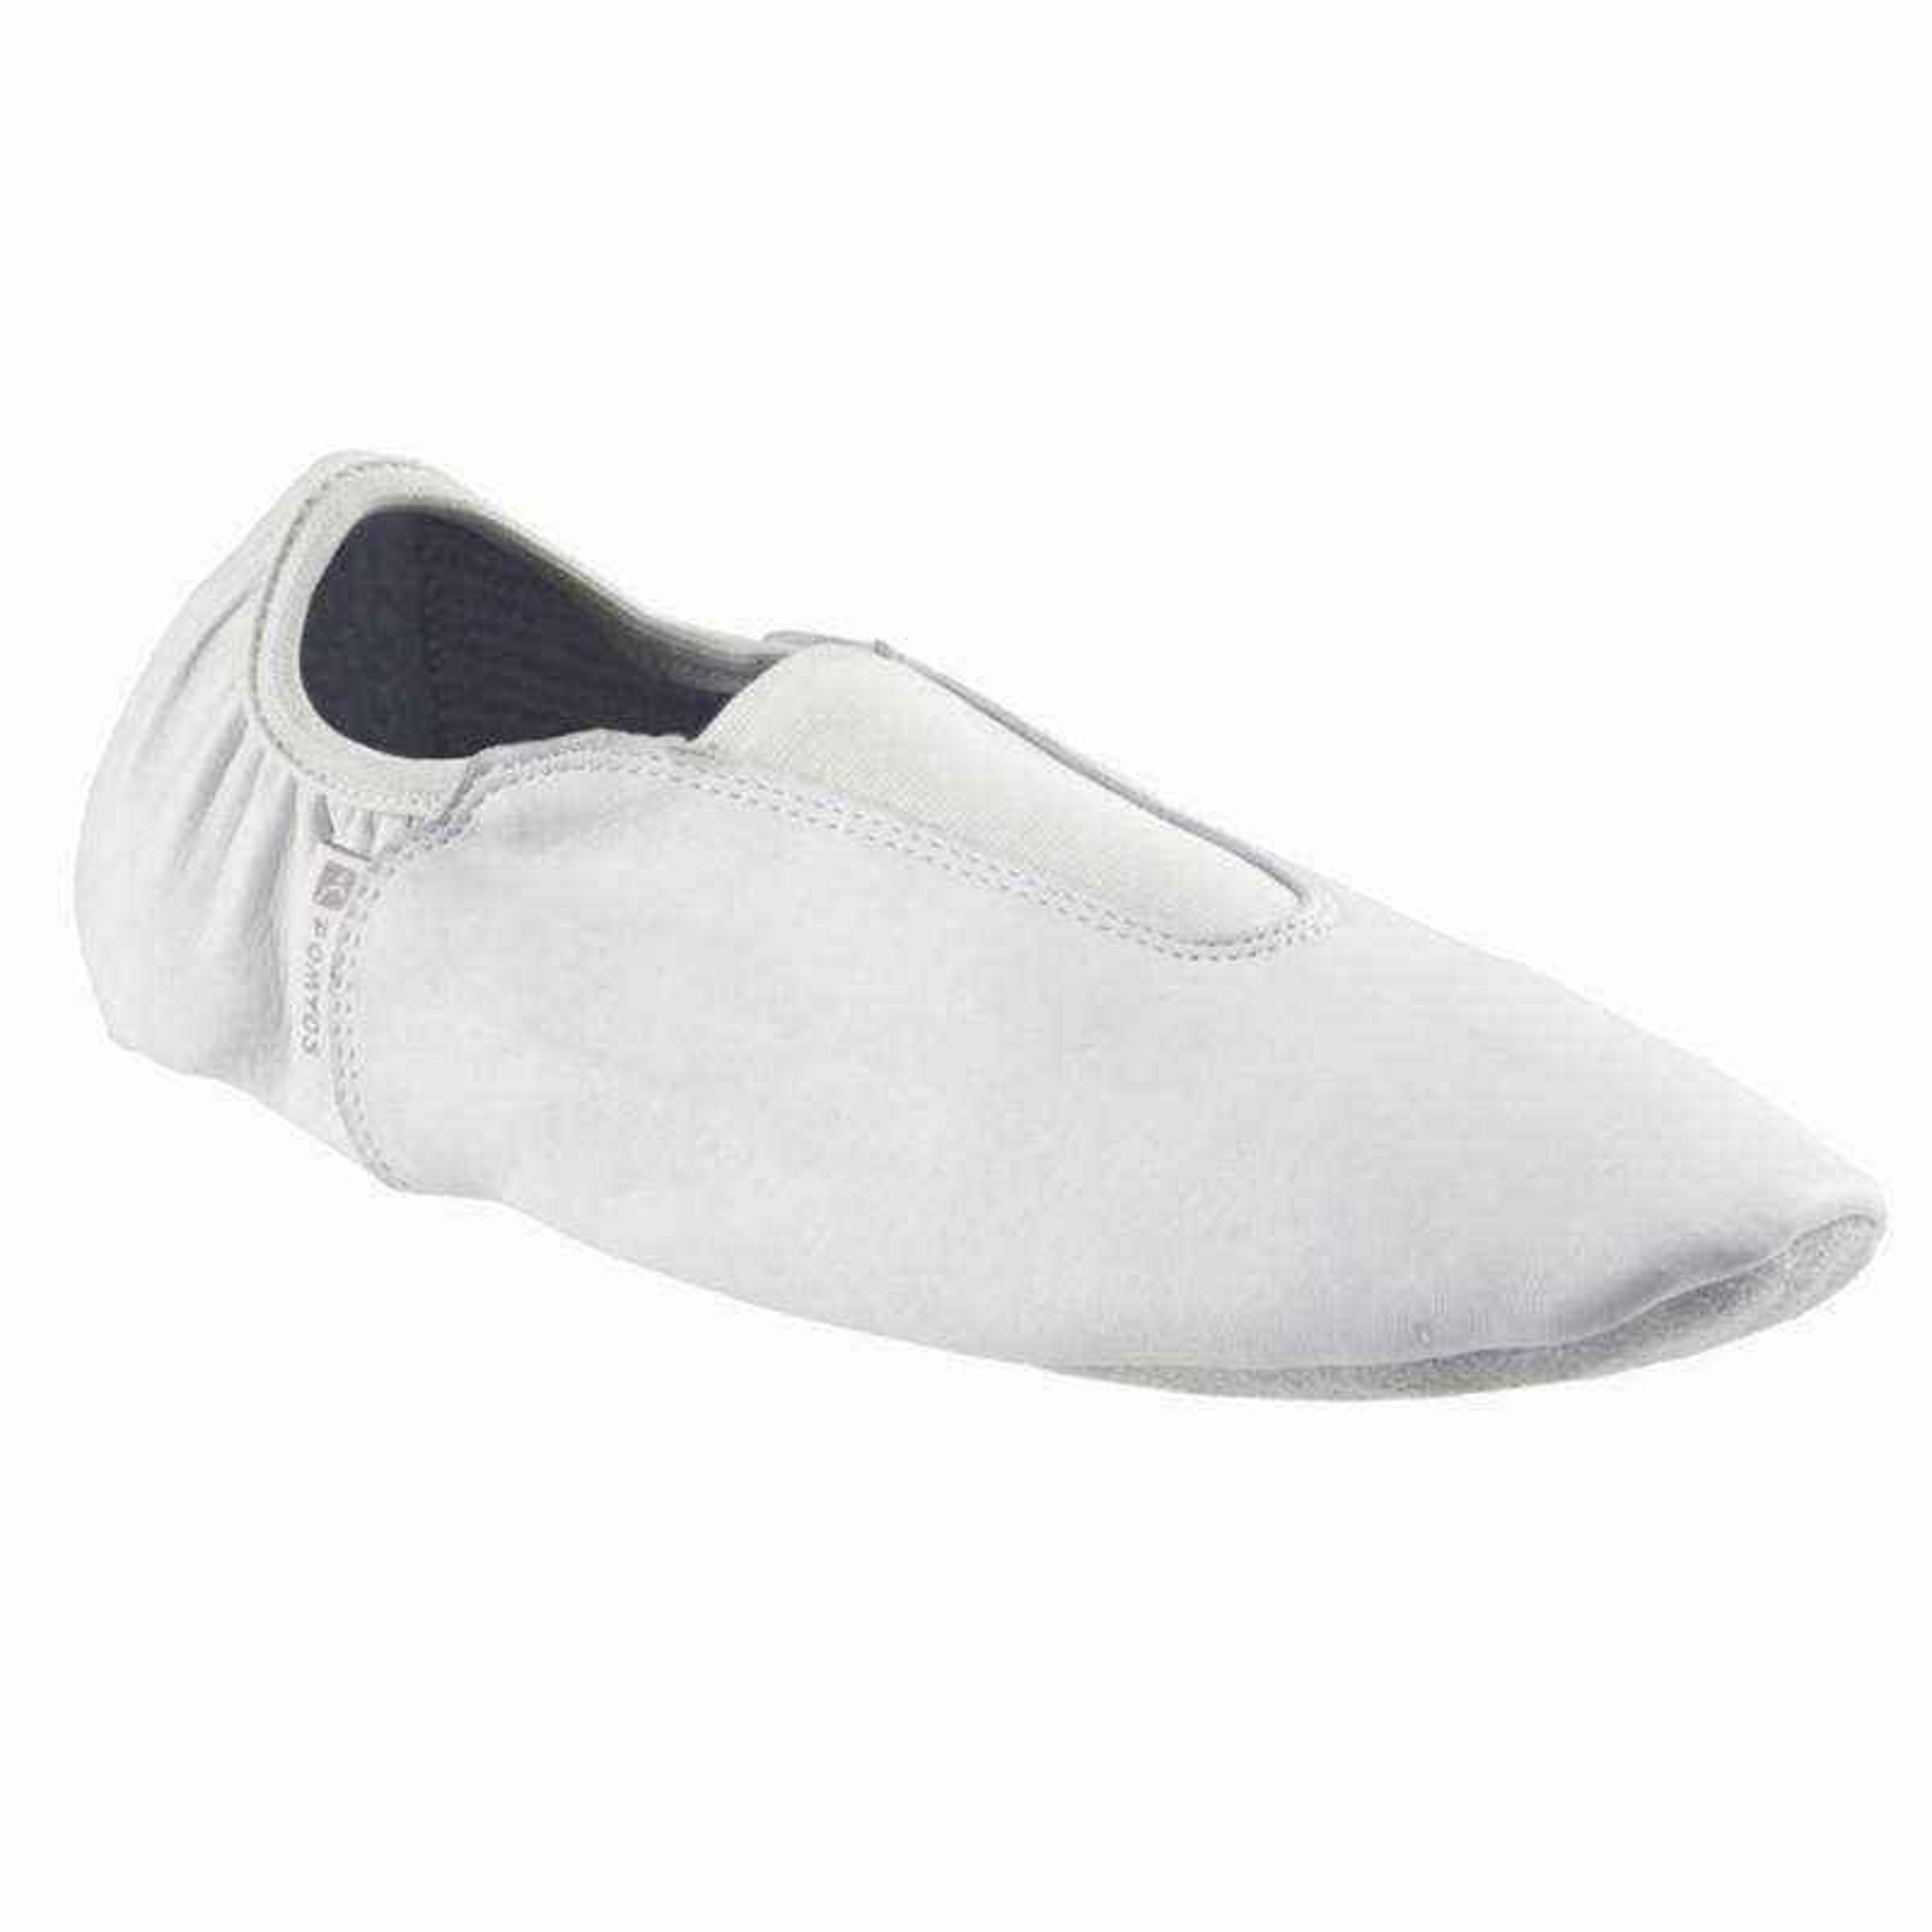 ARTISTIC GYMNASTICS SHOES - Leather Rhythmic Adult Gym Shoes - White DOMYOS